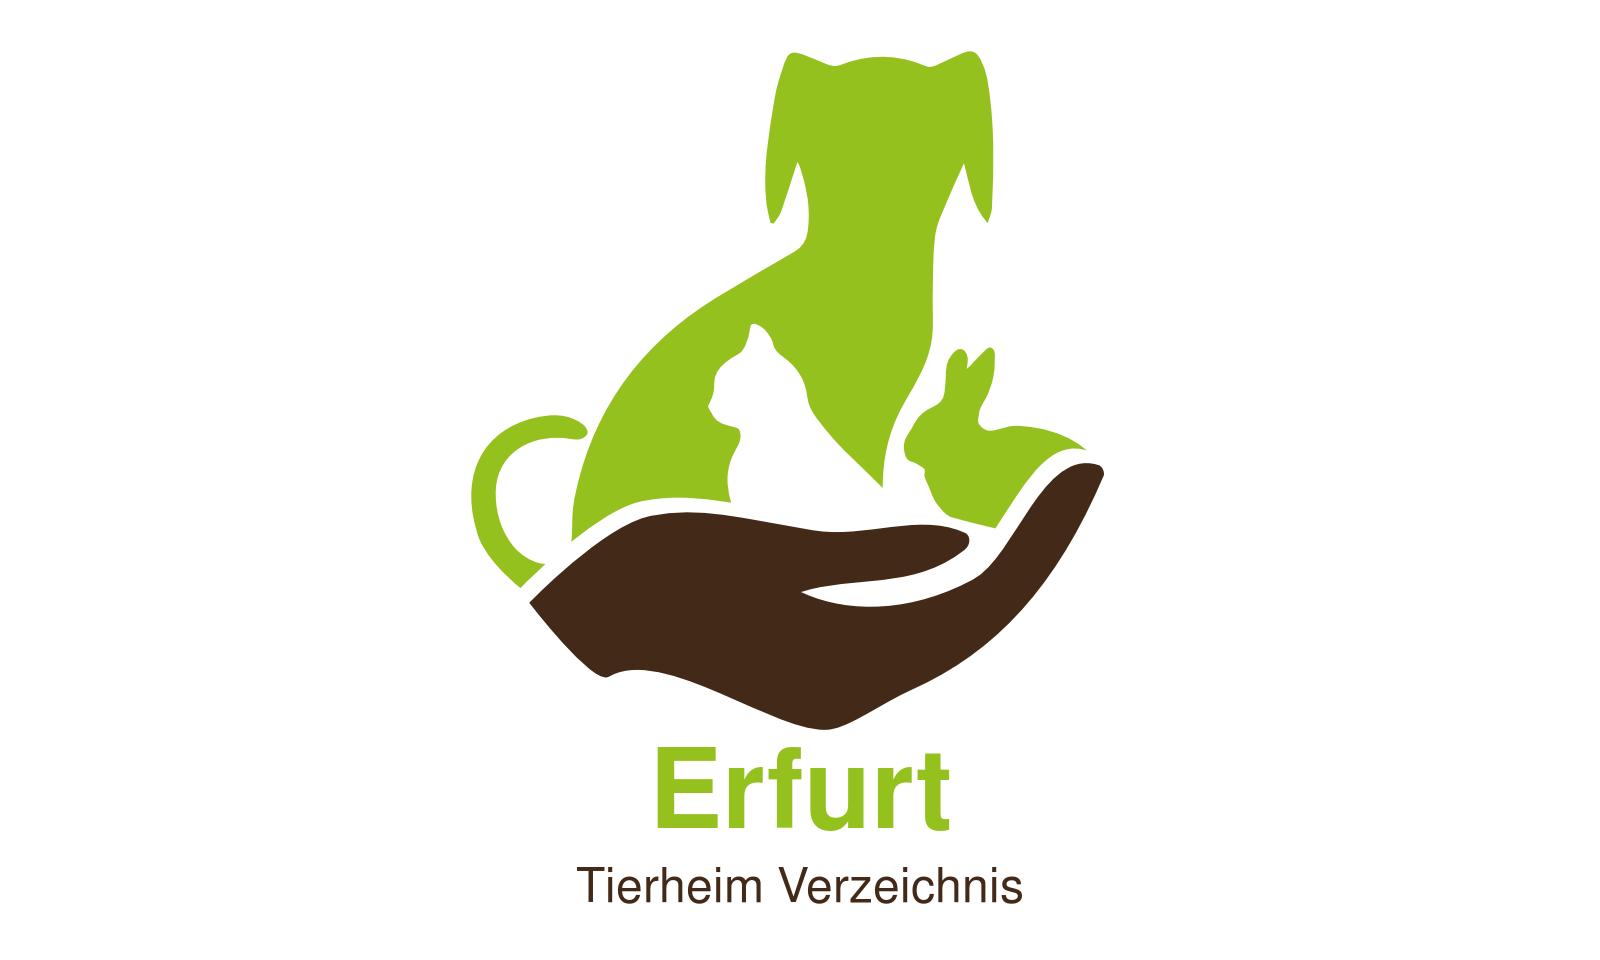 Tierheim Erfurt